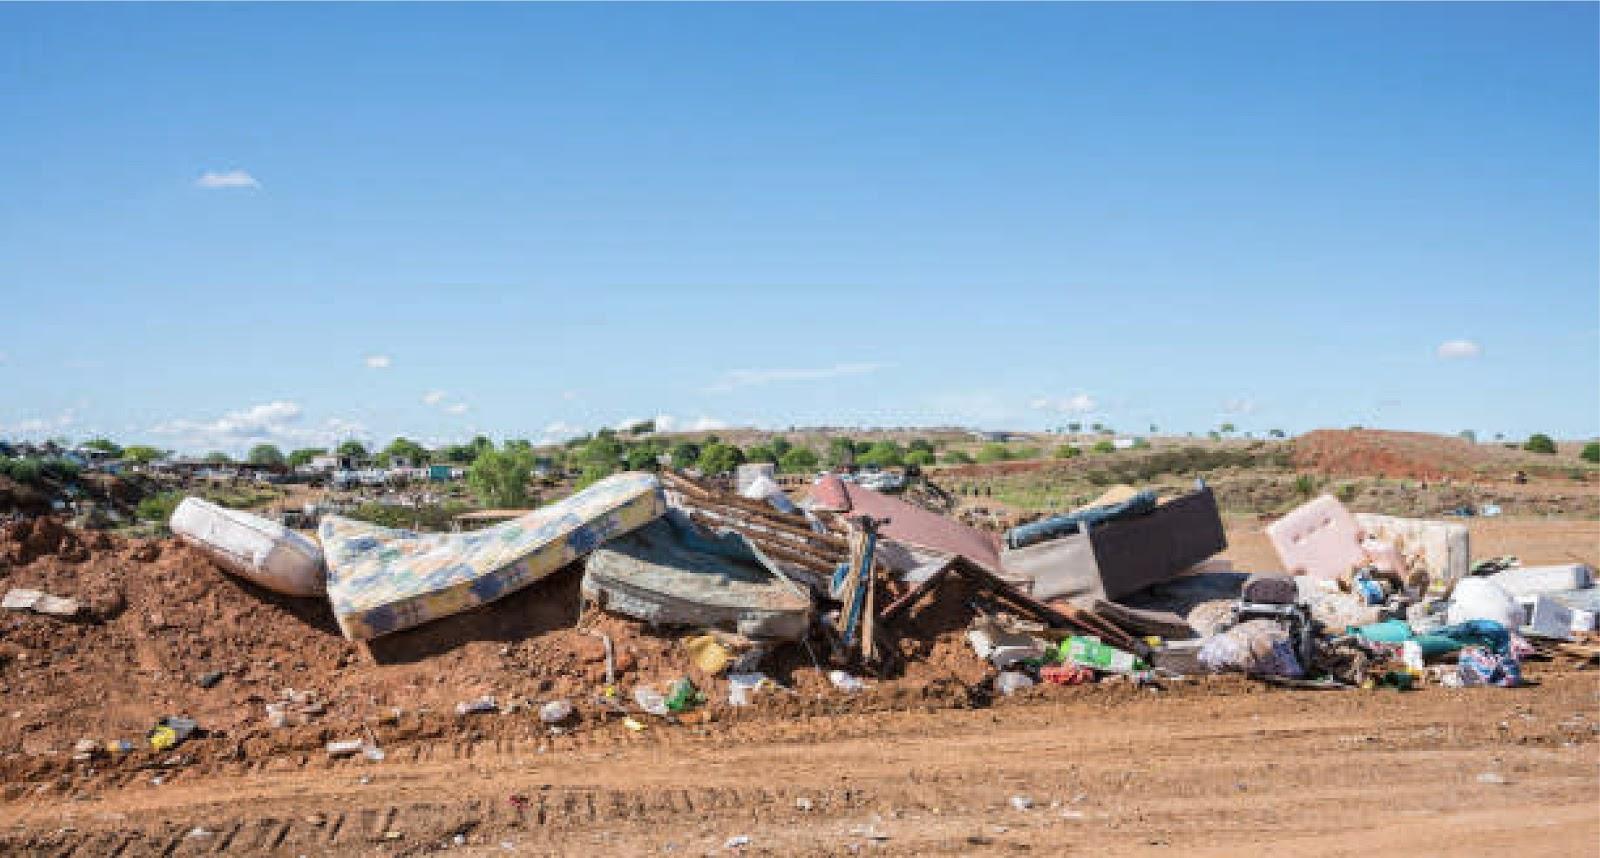 landfill with mattress